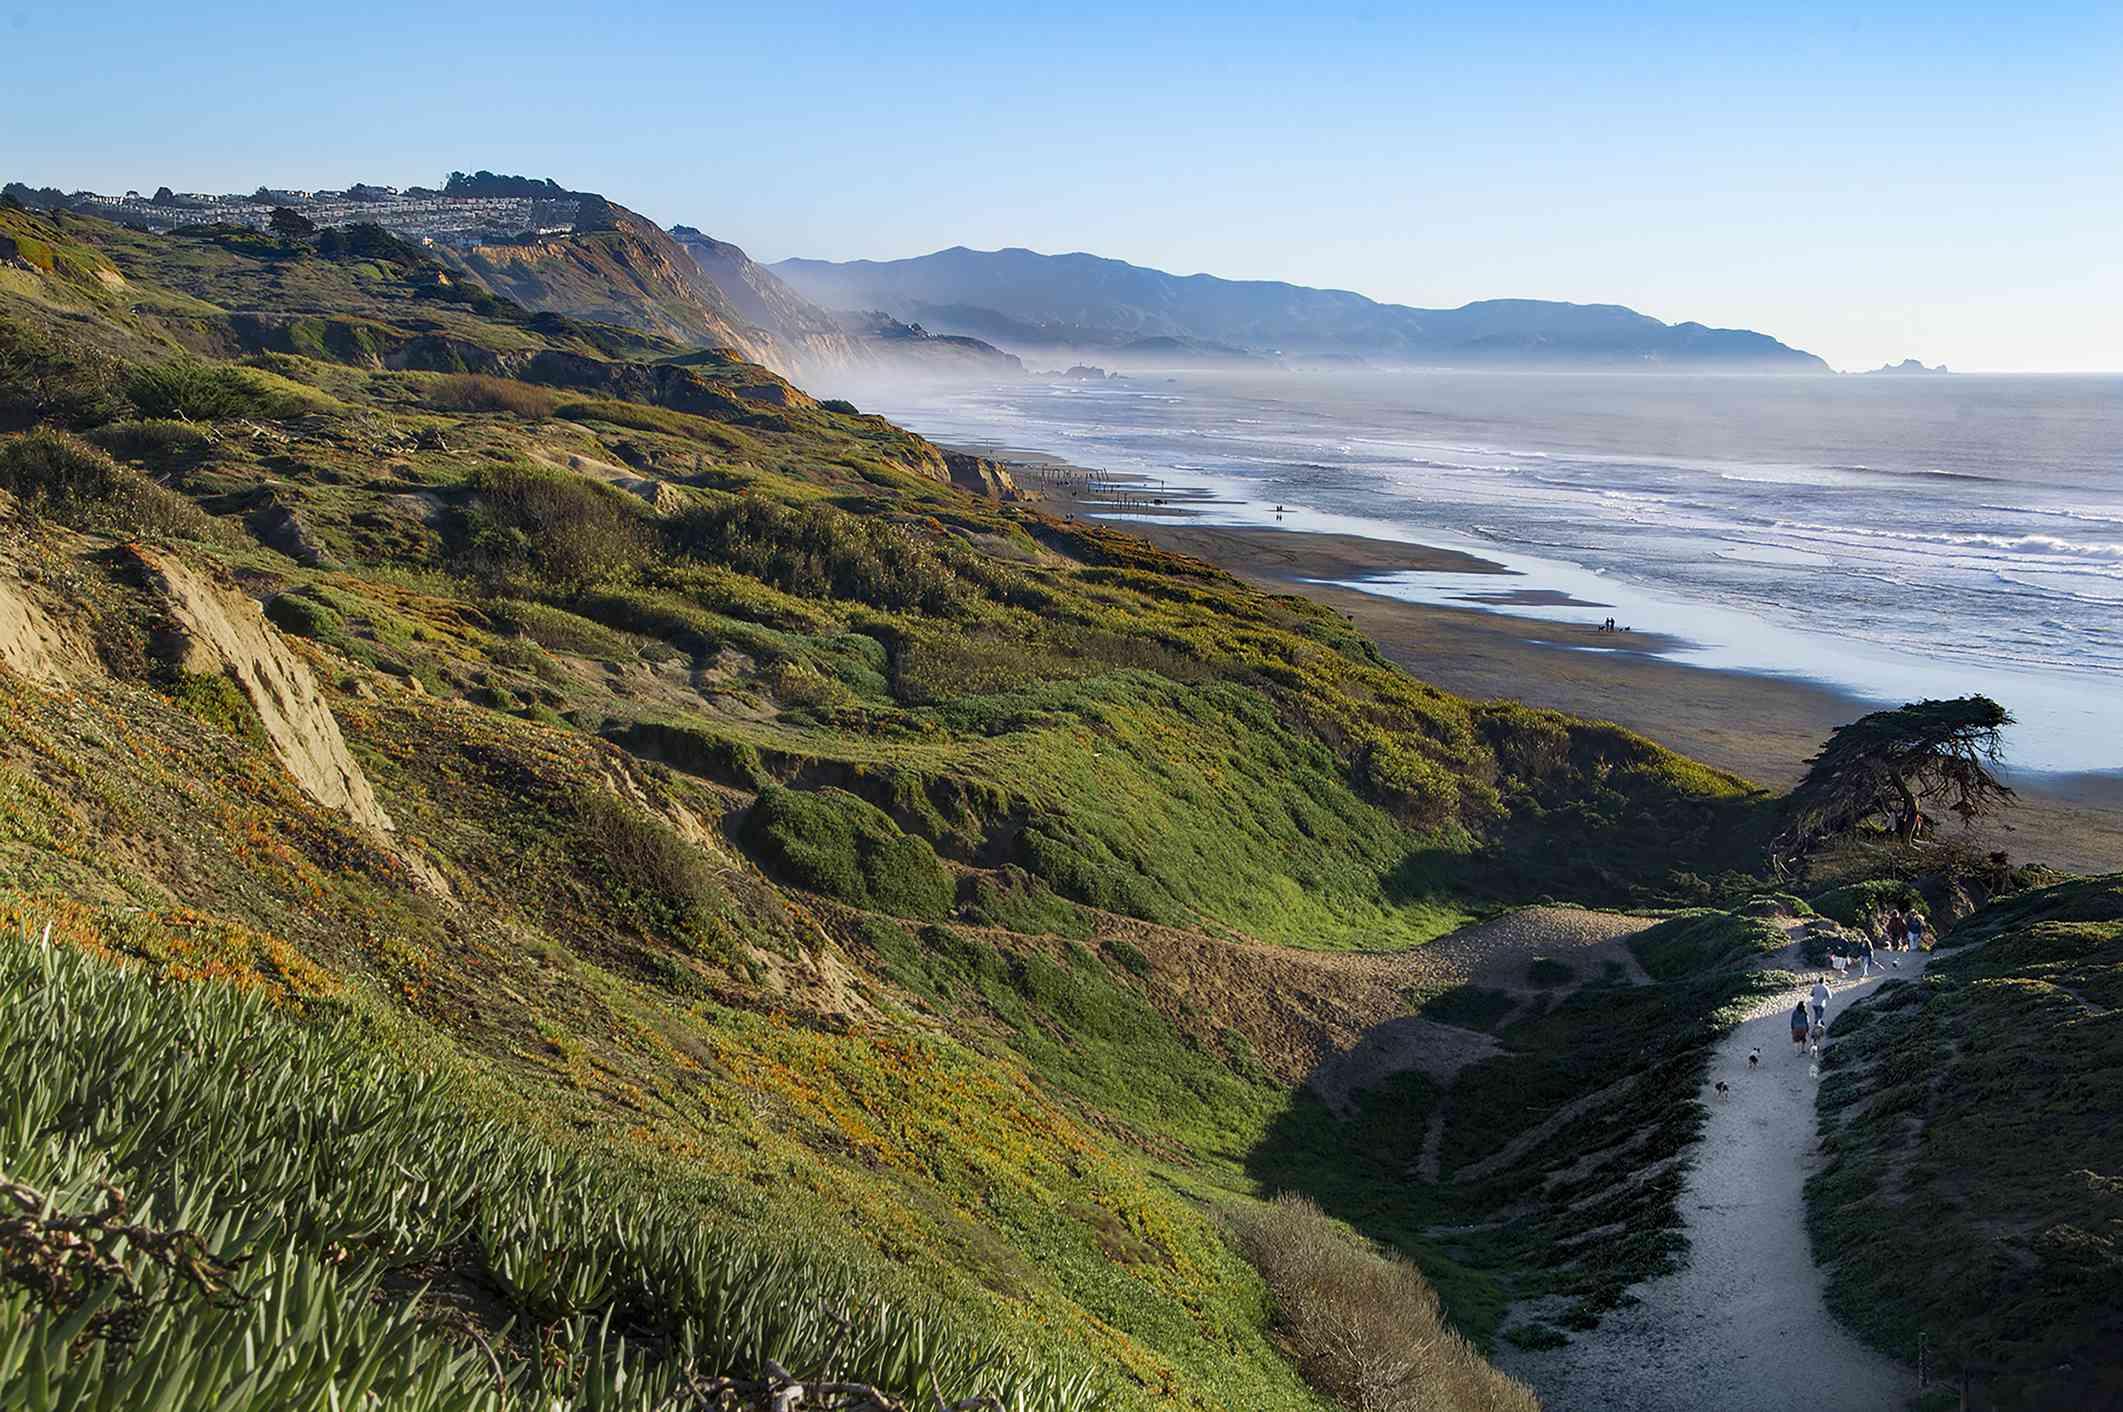 Fort Funston beach in San Francisco, California